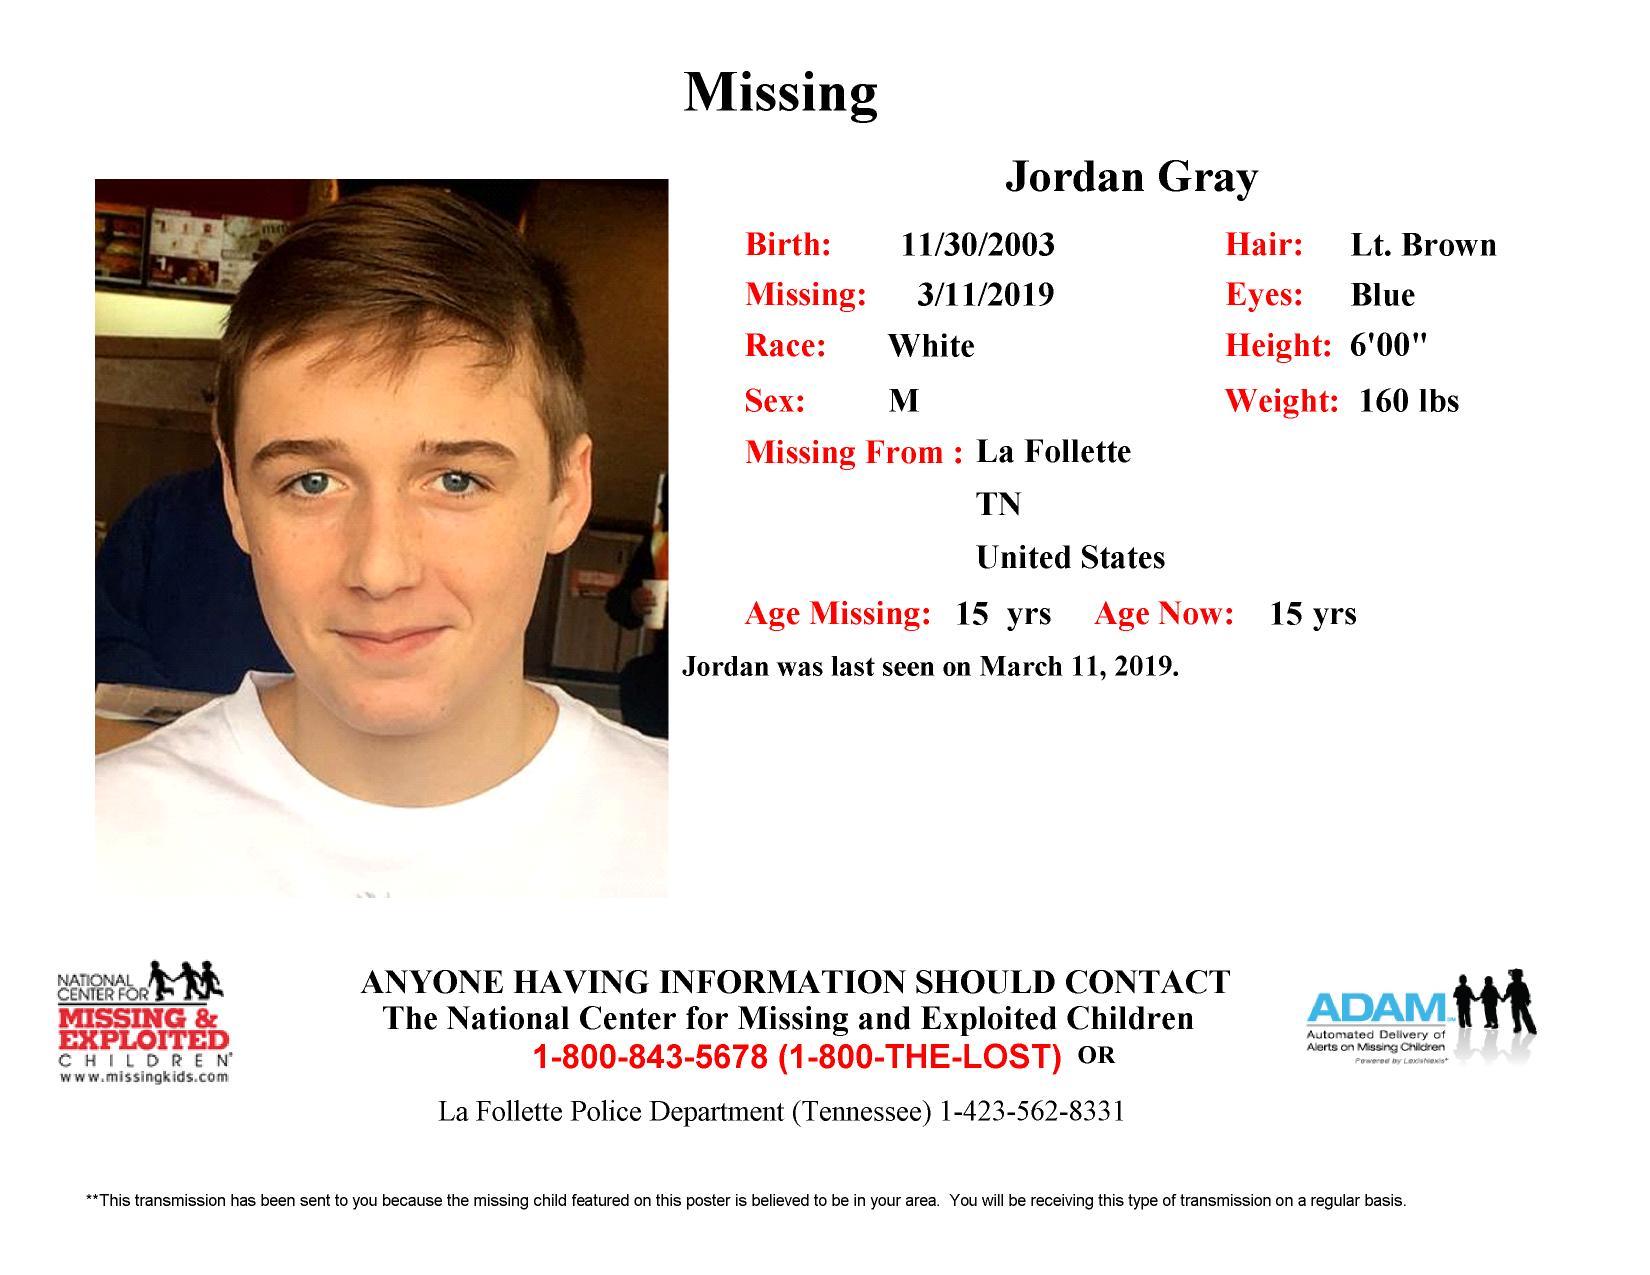 Missing: Jordan Gray